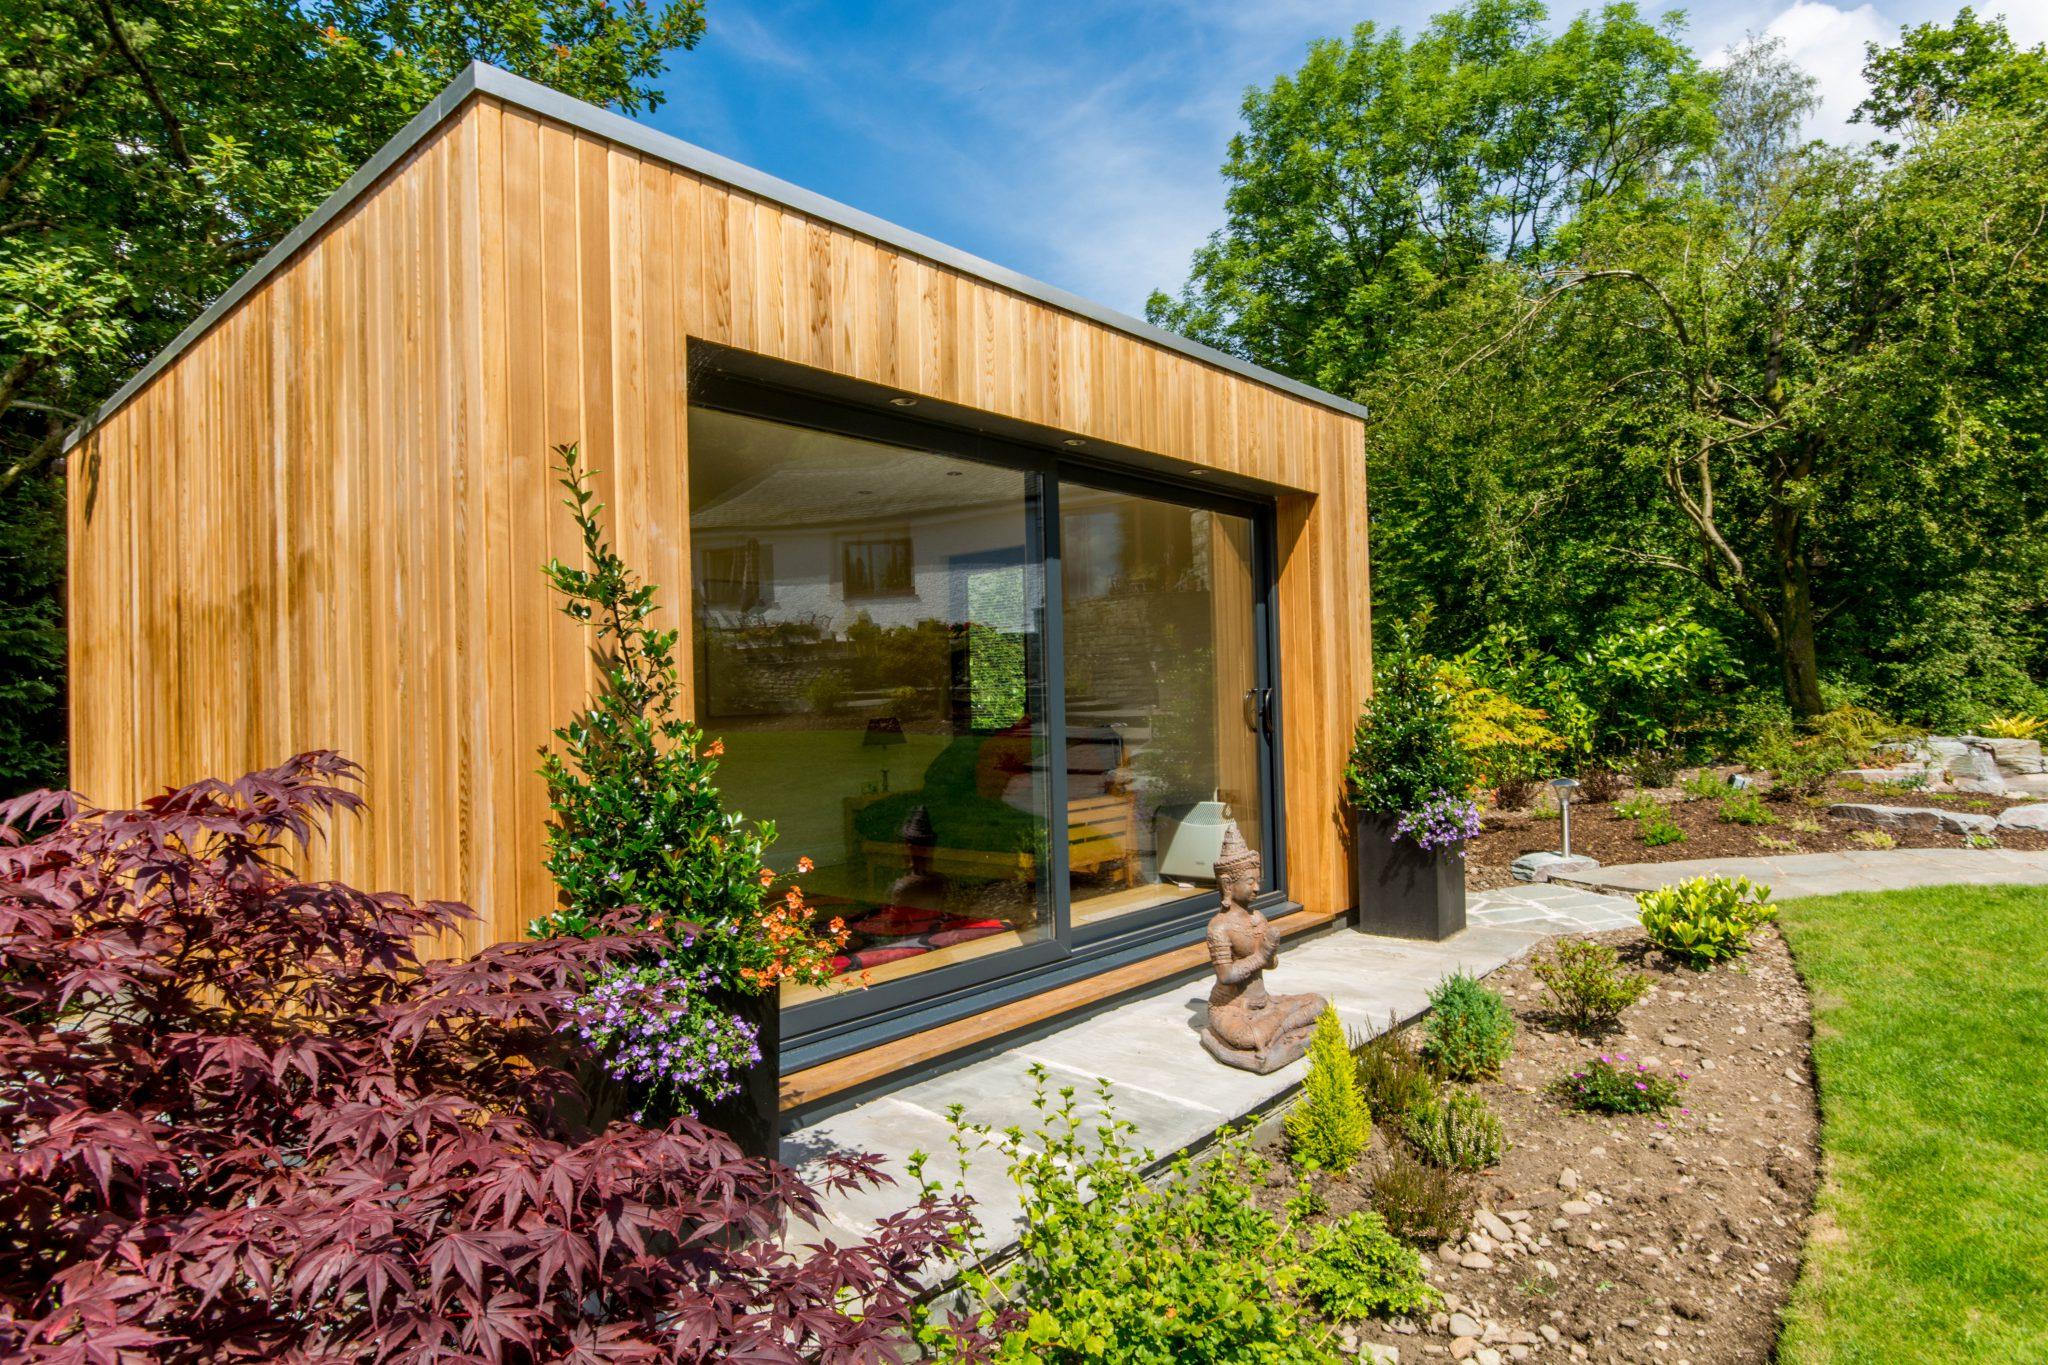 Room With A View Garden Design Part - 19: 0045_Swift Garden Rooms Grasmere-24 ...